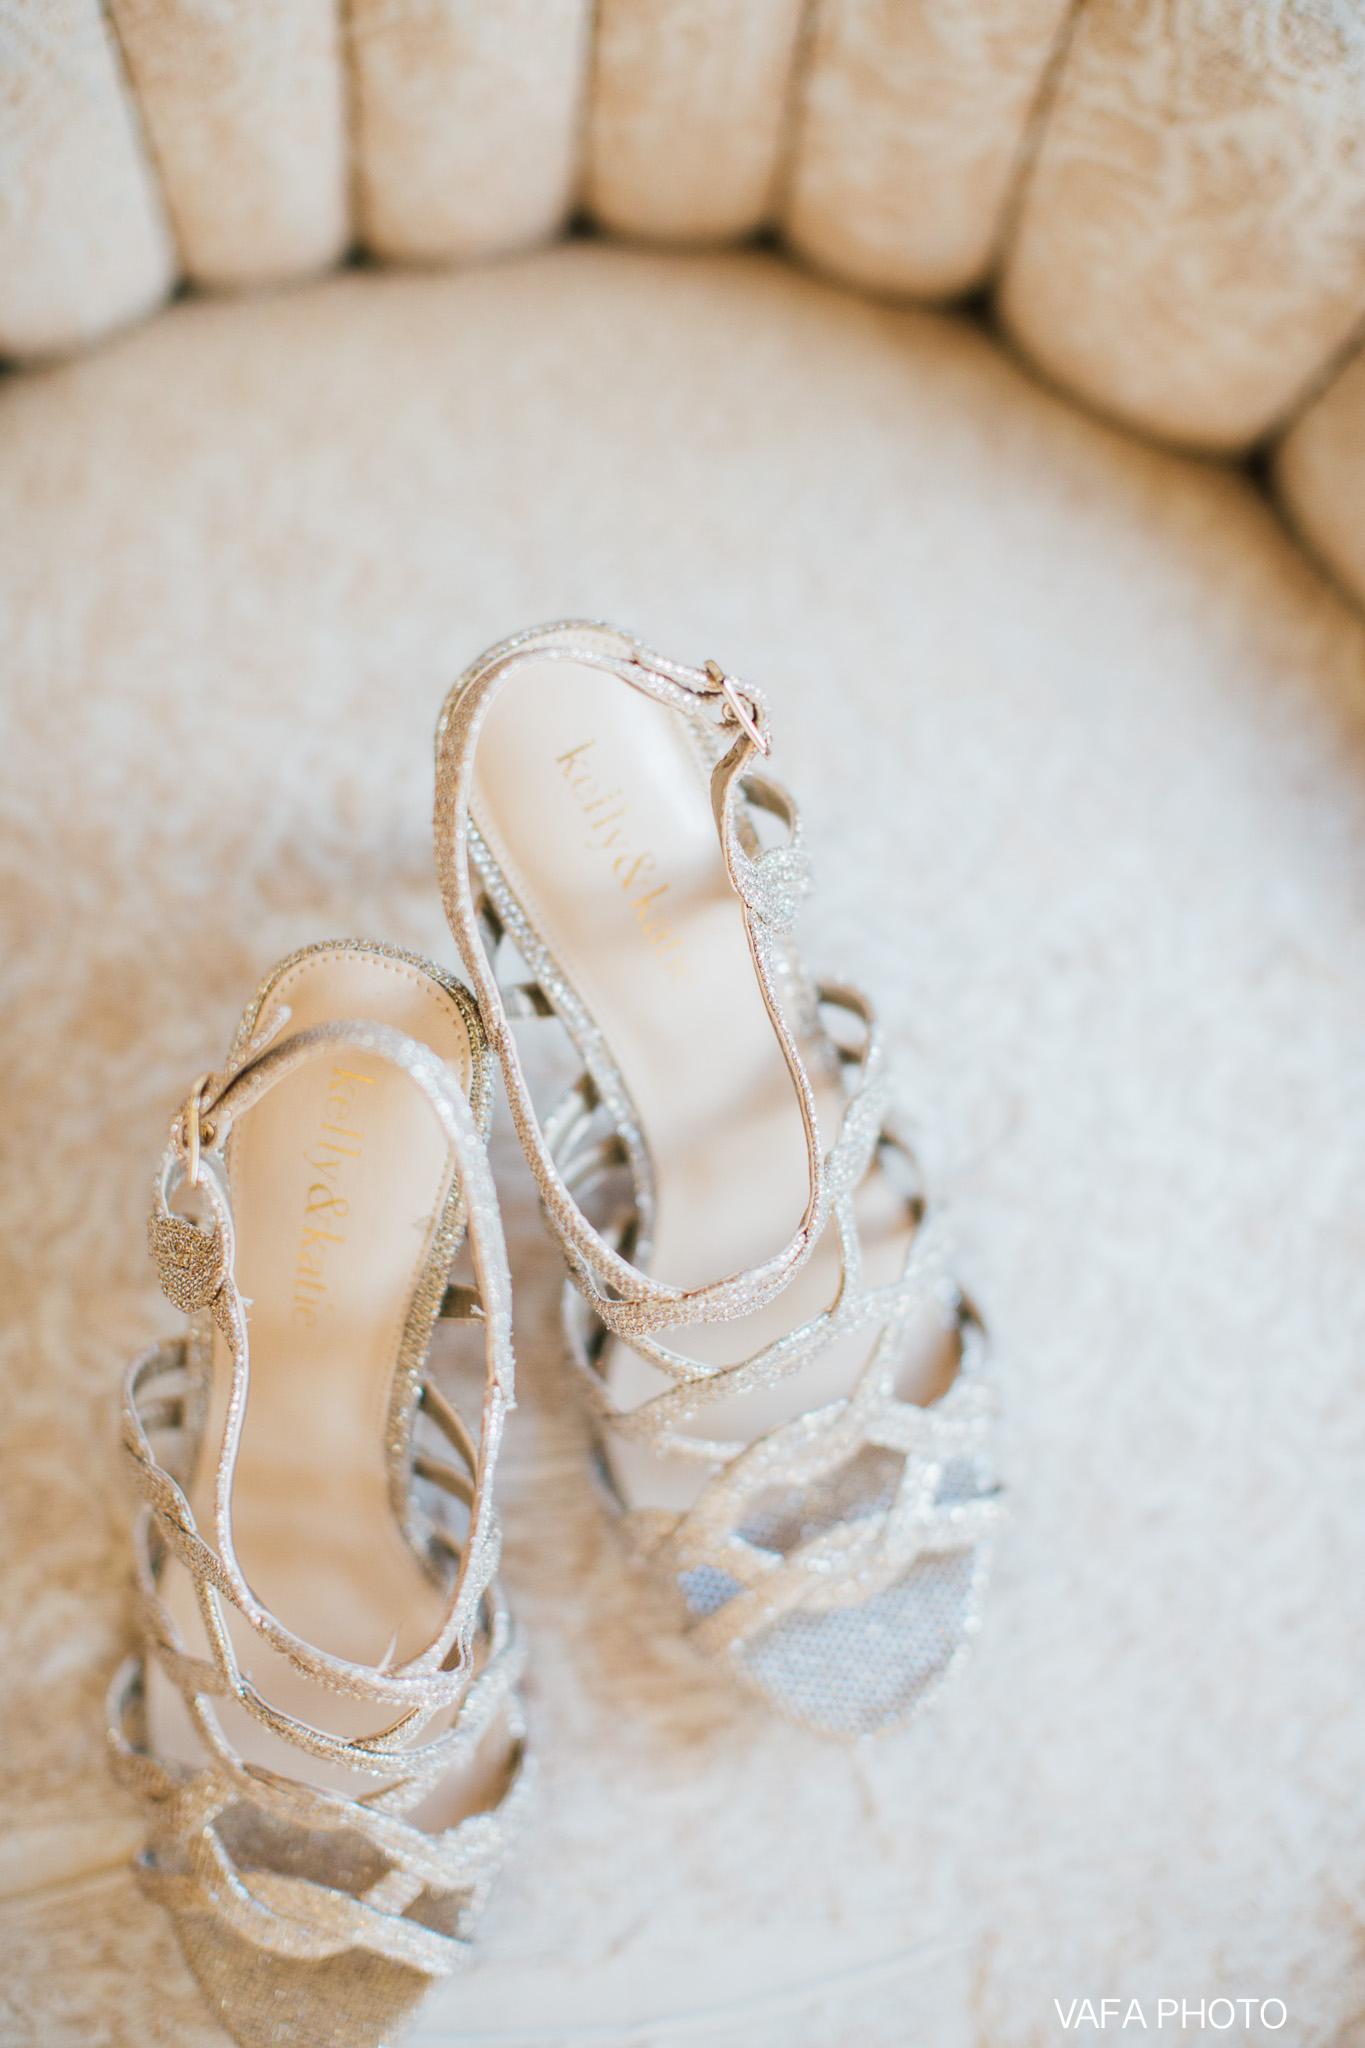 The-Felt-Estate-Wedding-Kailie-David-Vafa-Photo-82.jpg